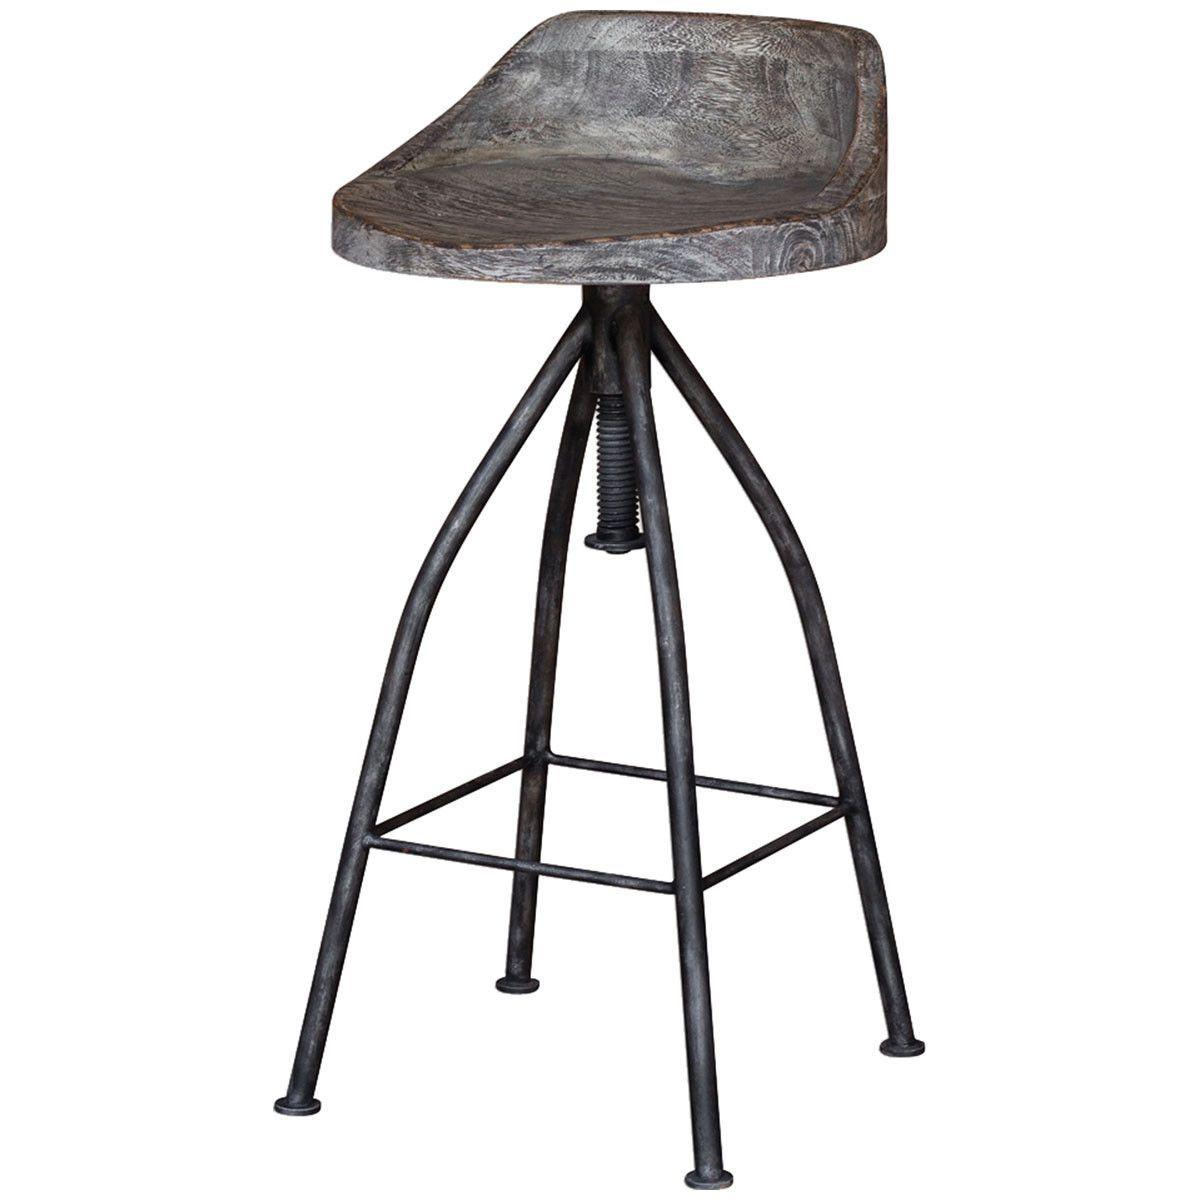 Uttermost Kairu Gray Glazed Driftwood Bar Stool | Bar stools | Pinterest